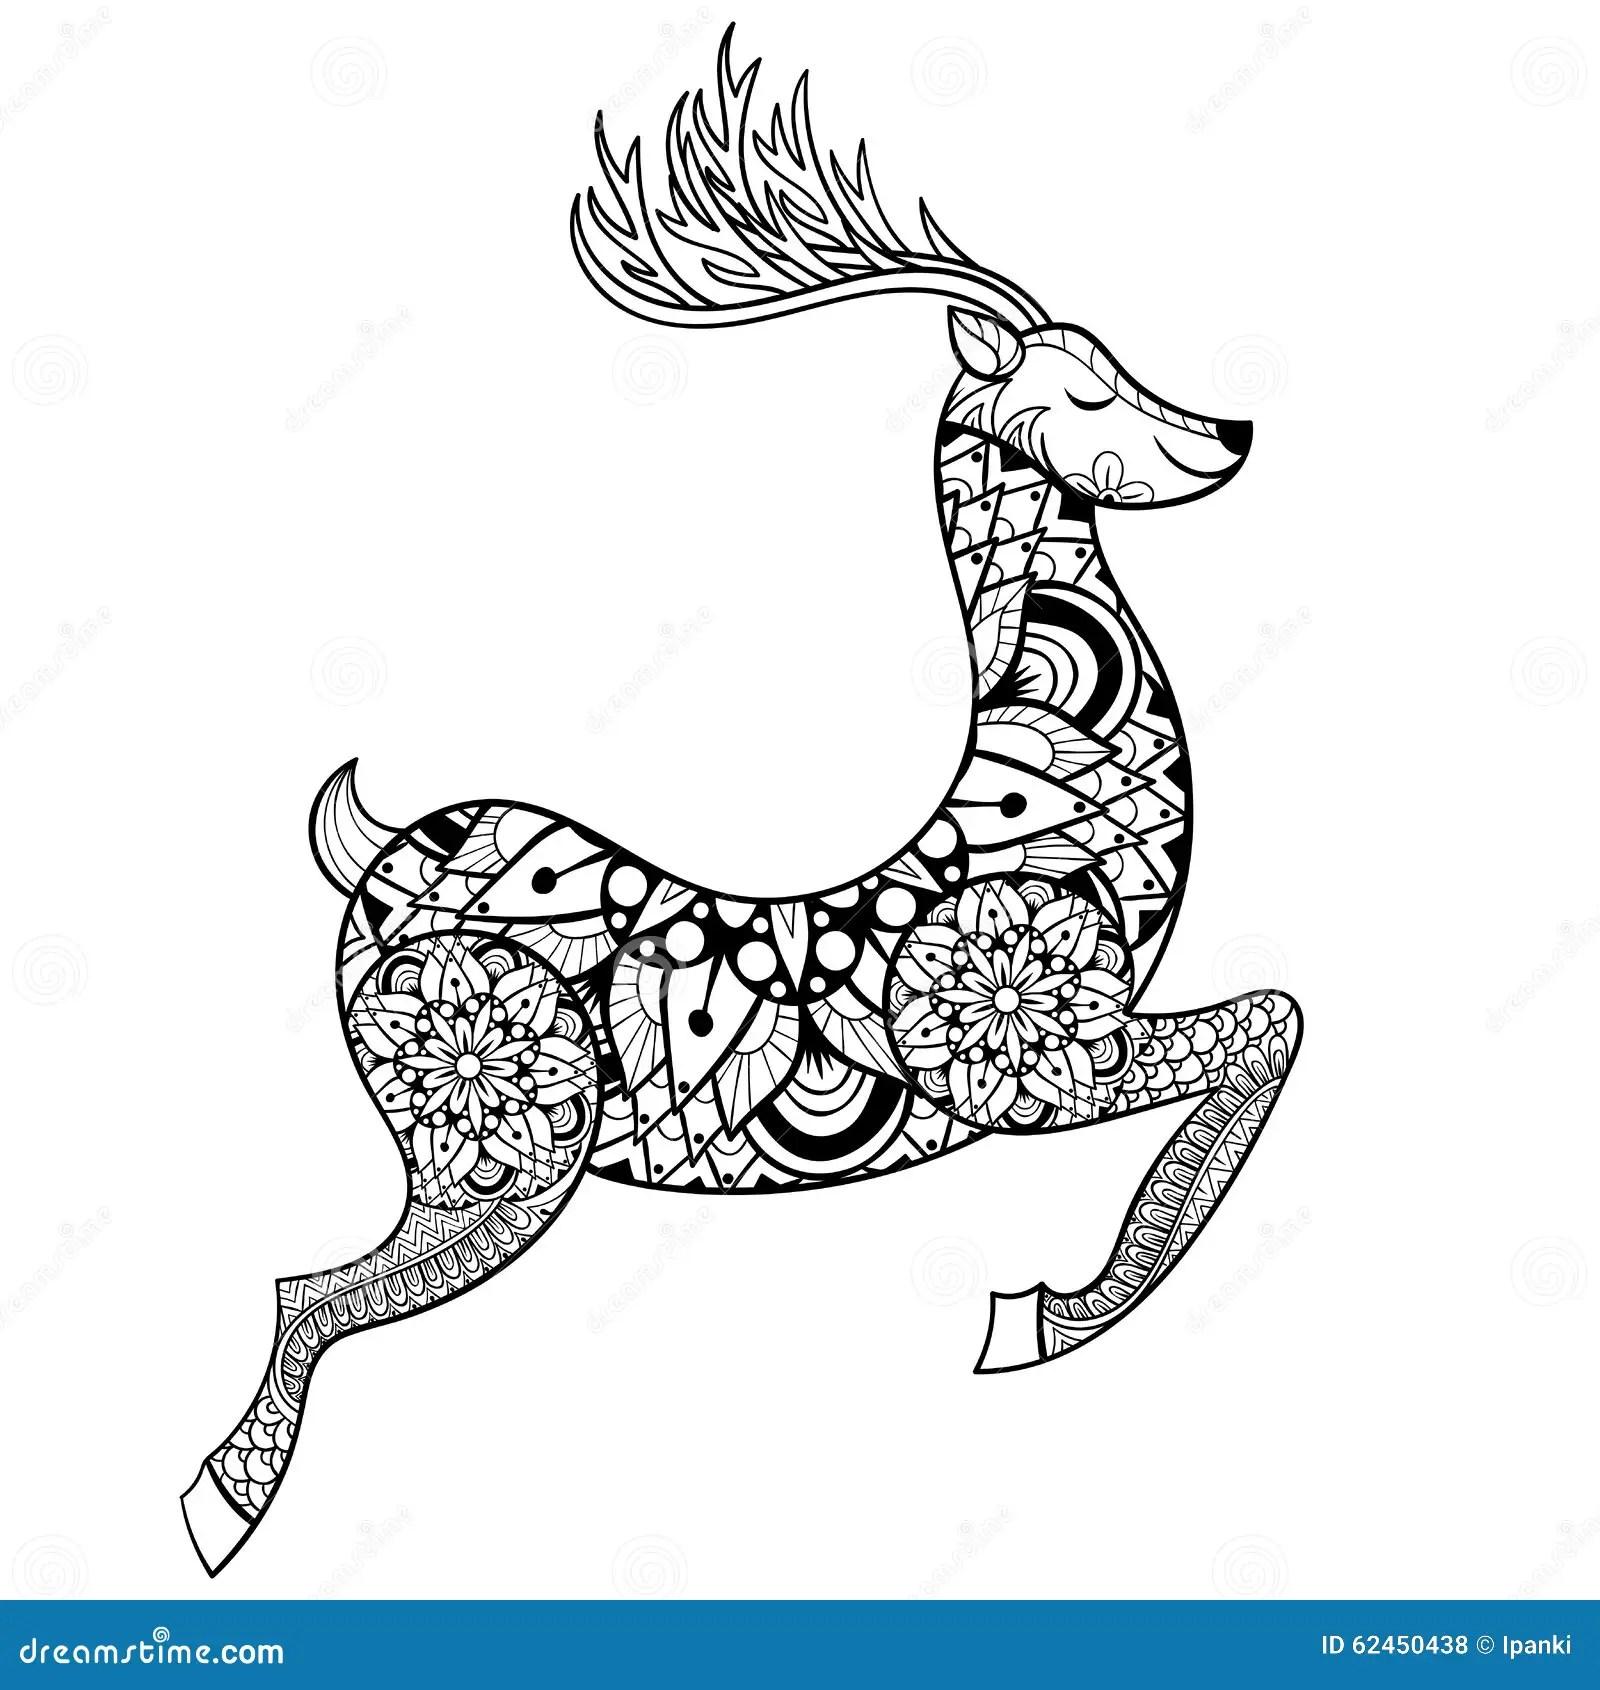 Zentangle Vector Reindeer For Adult Anti Stress Coloring